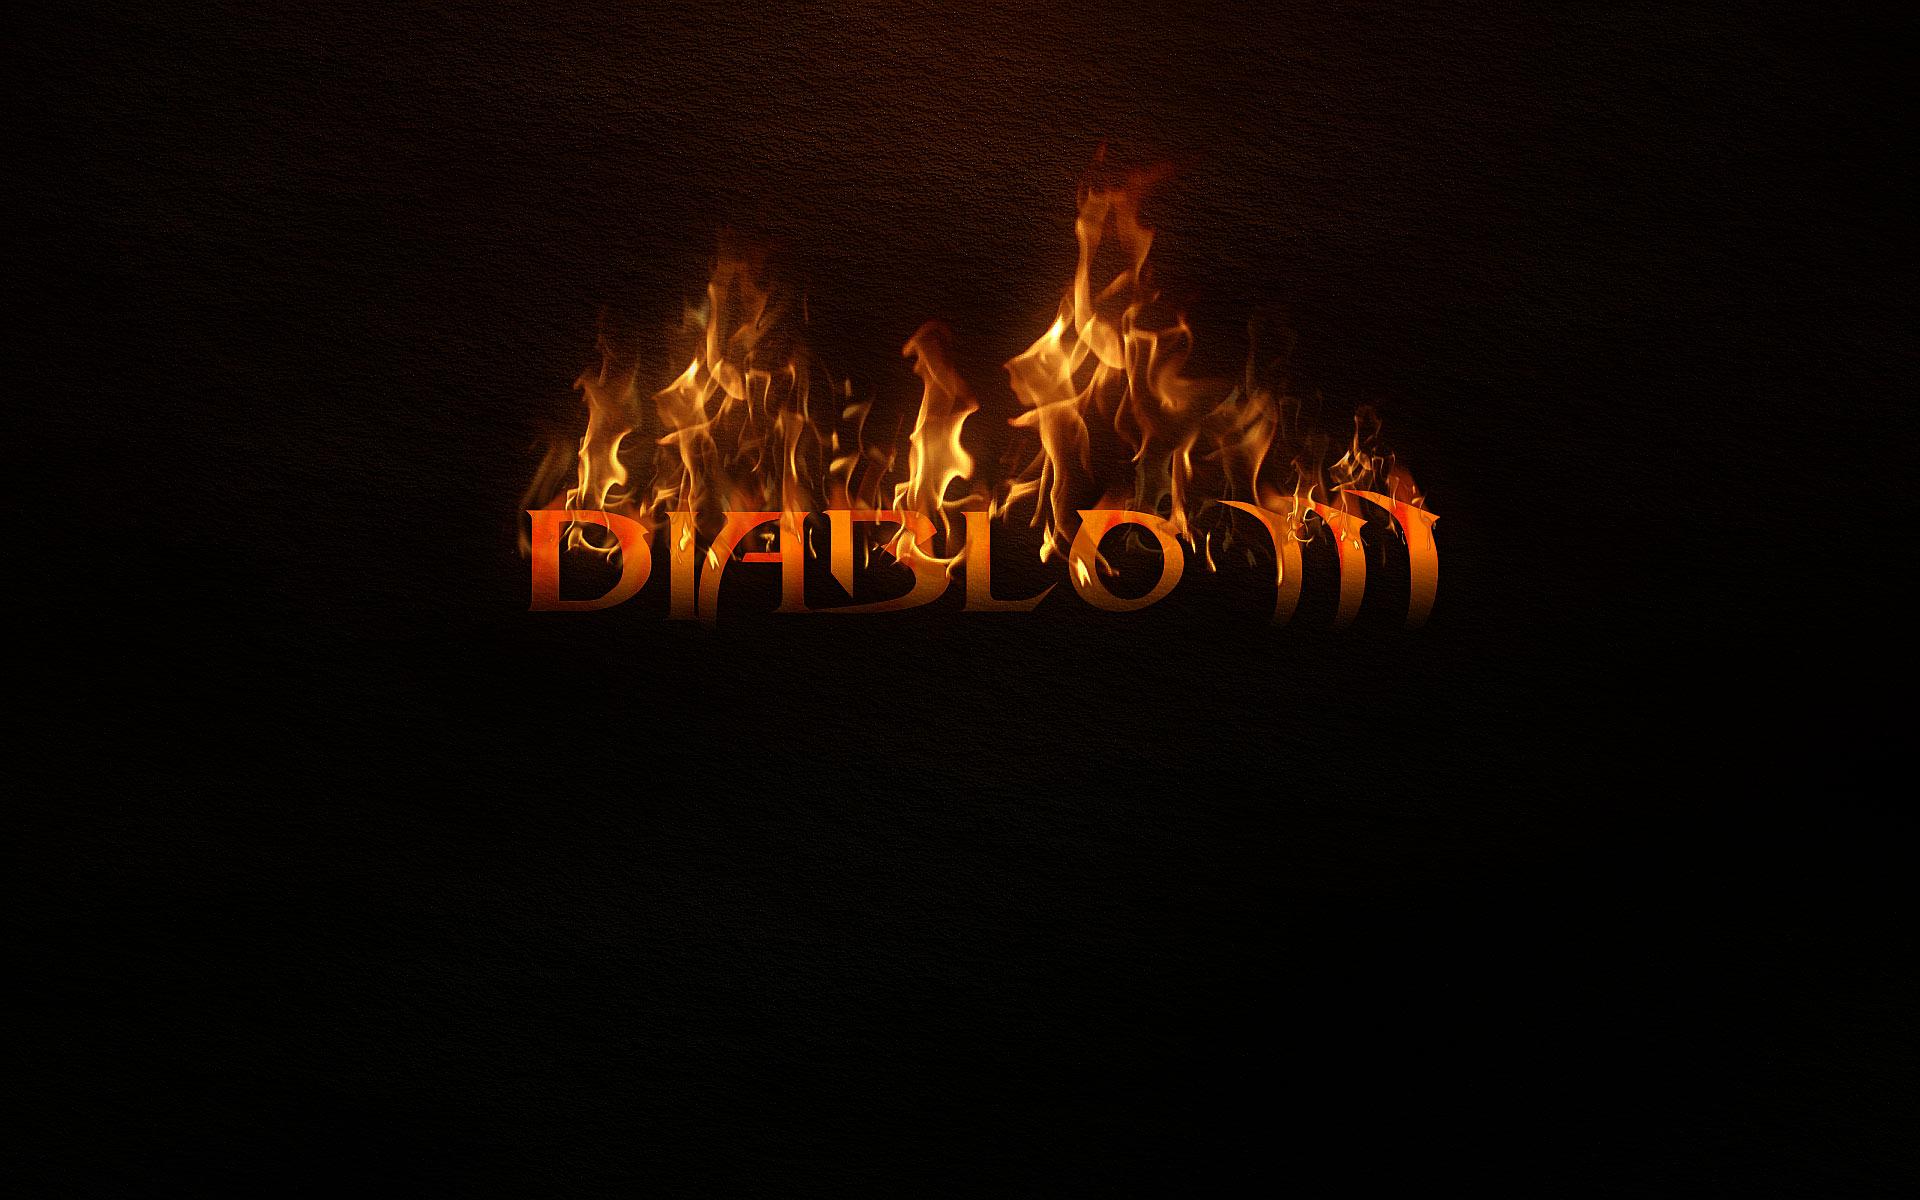 Games Wallpapers   Diablo 3 Burning Letters wallpaper 1920x1200